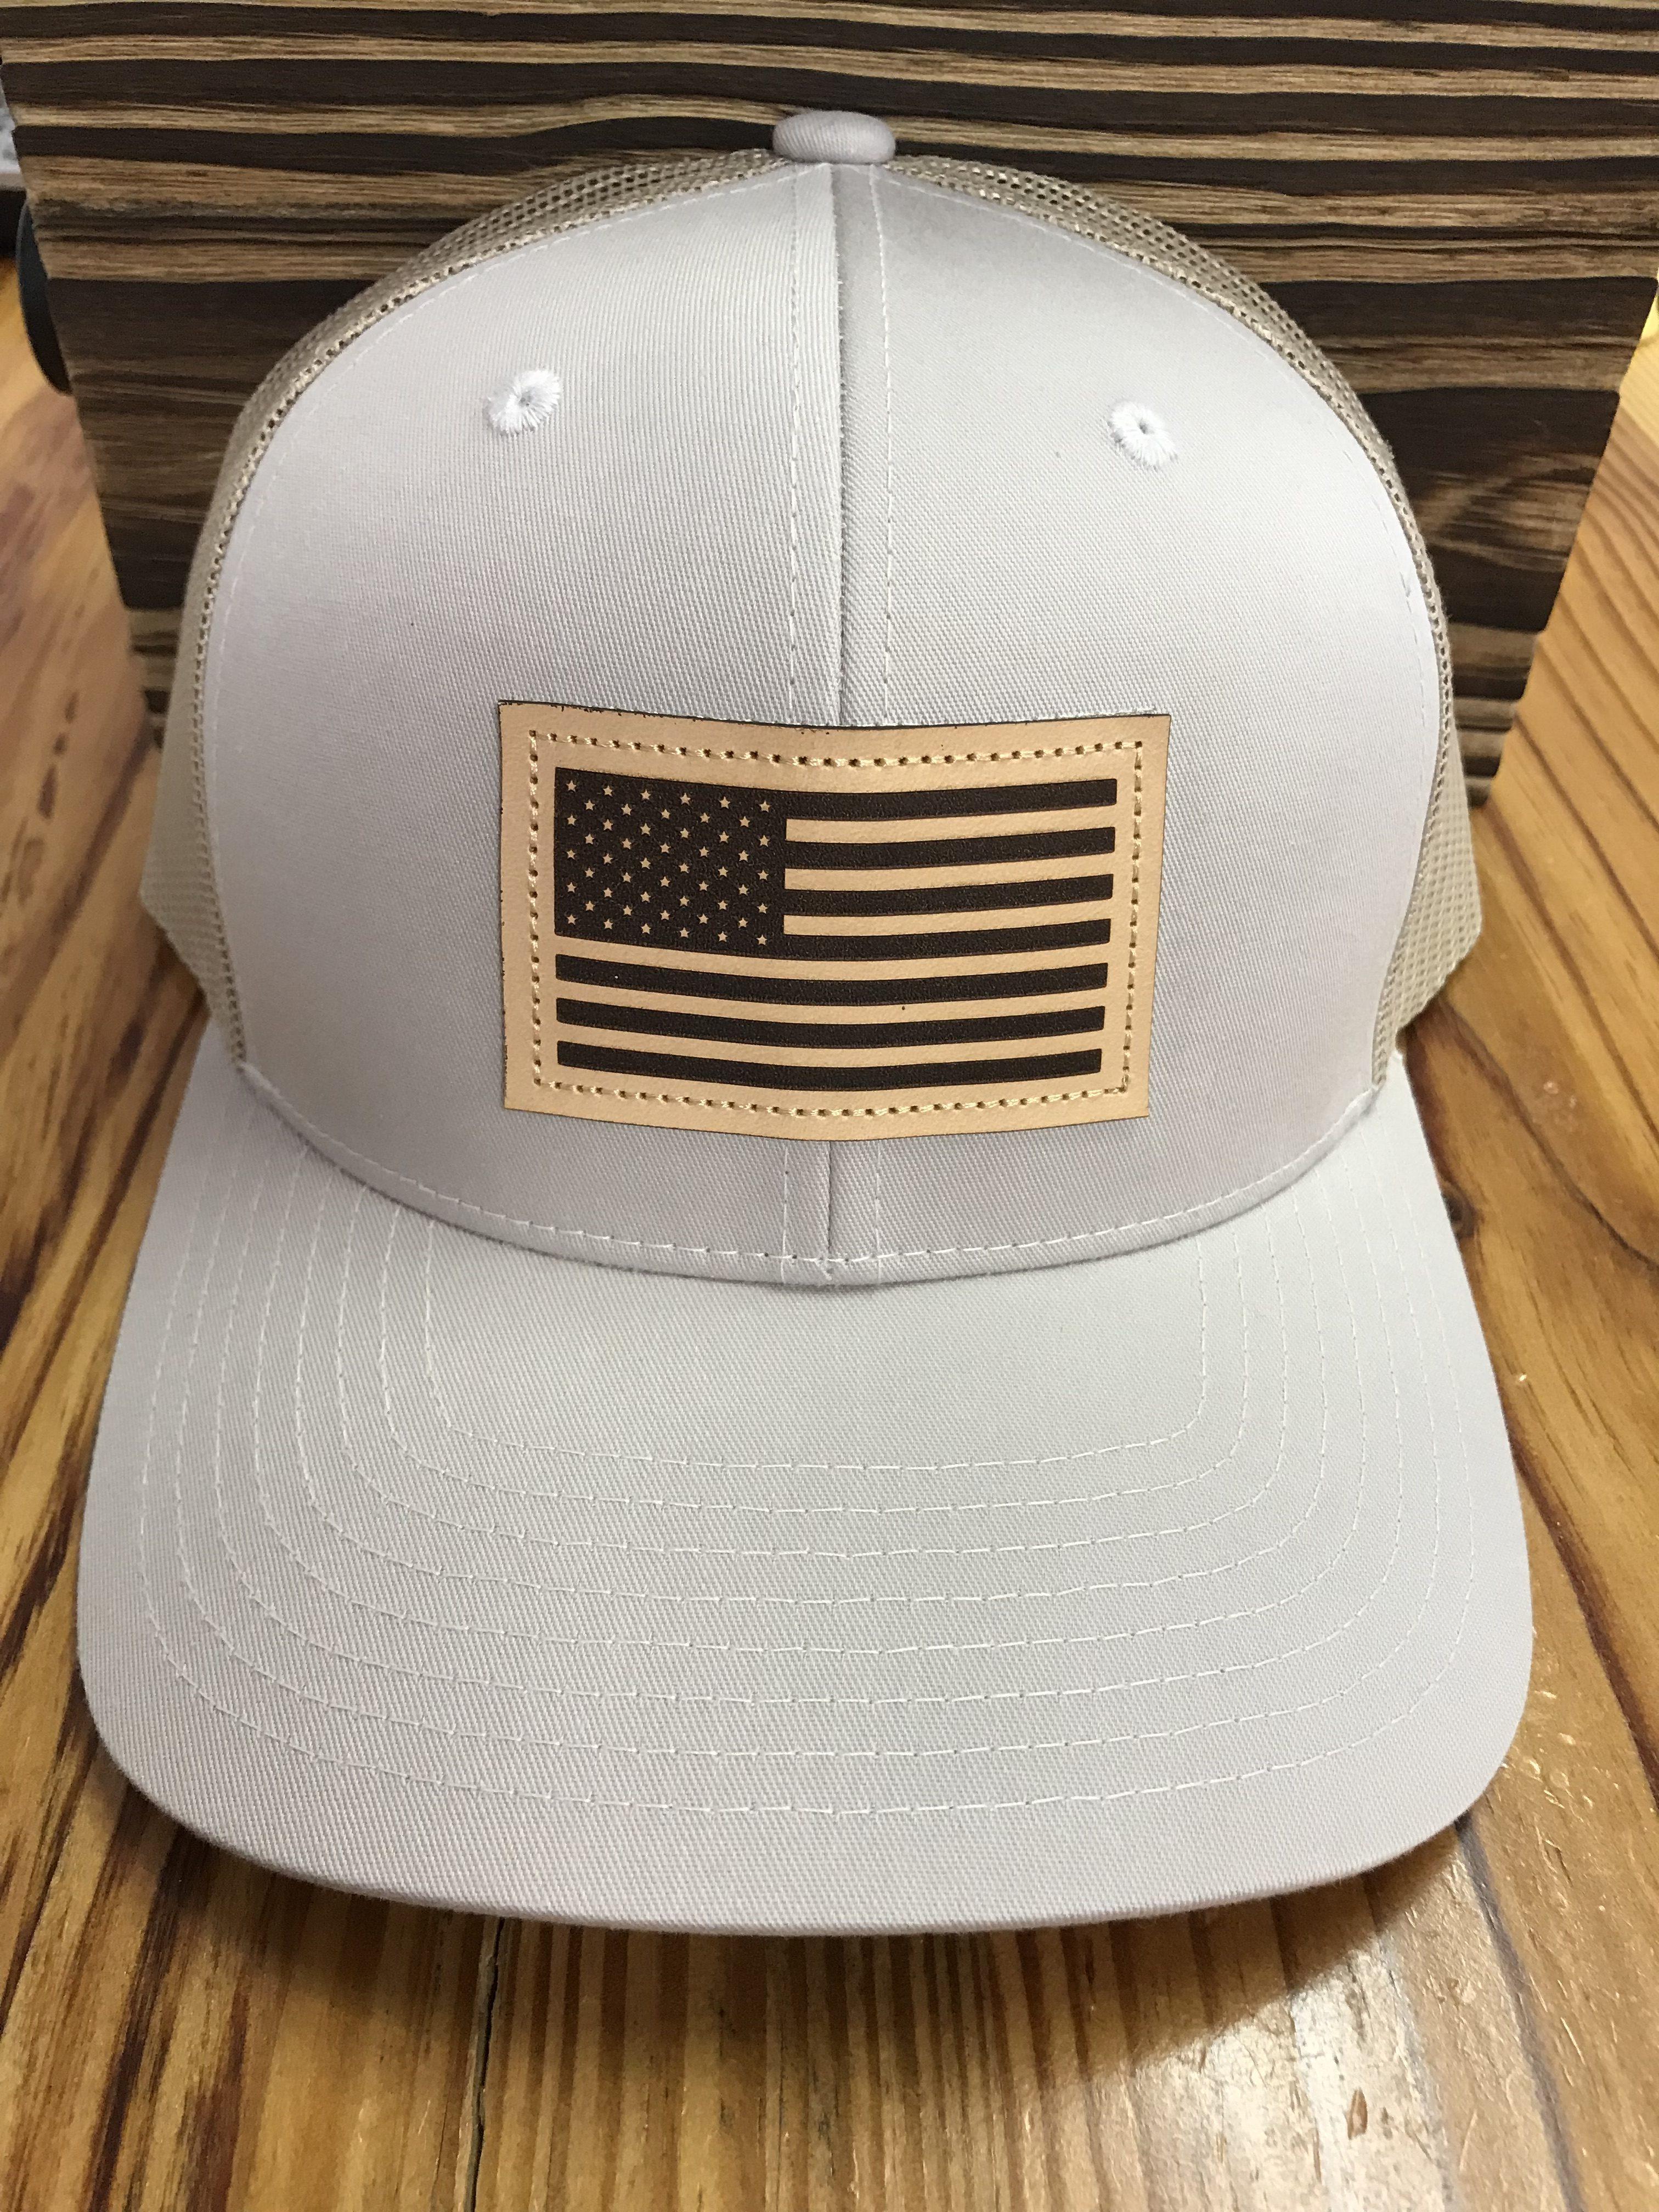 43b8d6dd Captuer USA Flag Leather Patch Trucker Hat Tan